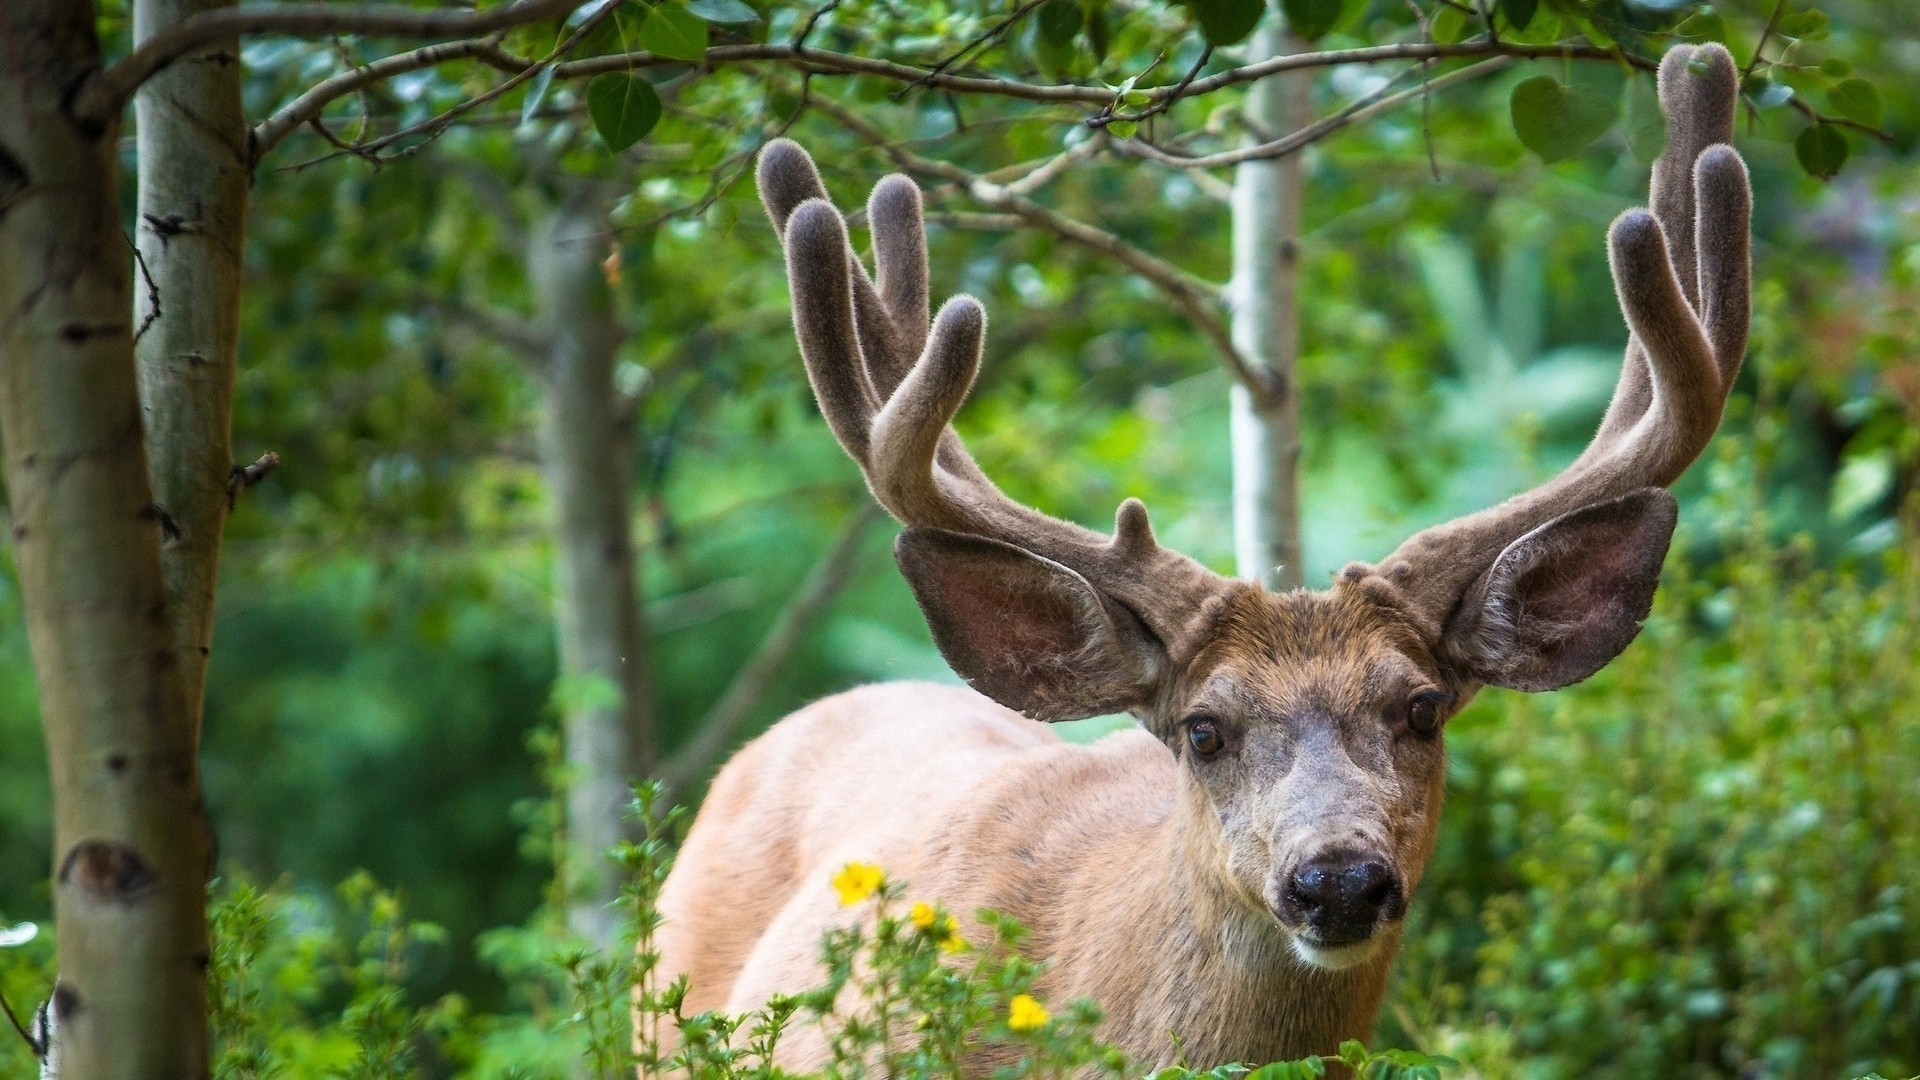 Deer Wallpaper and Background